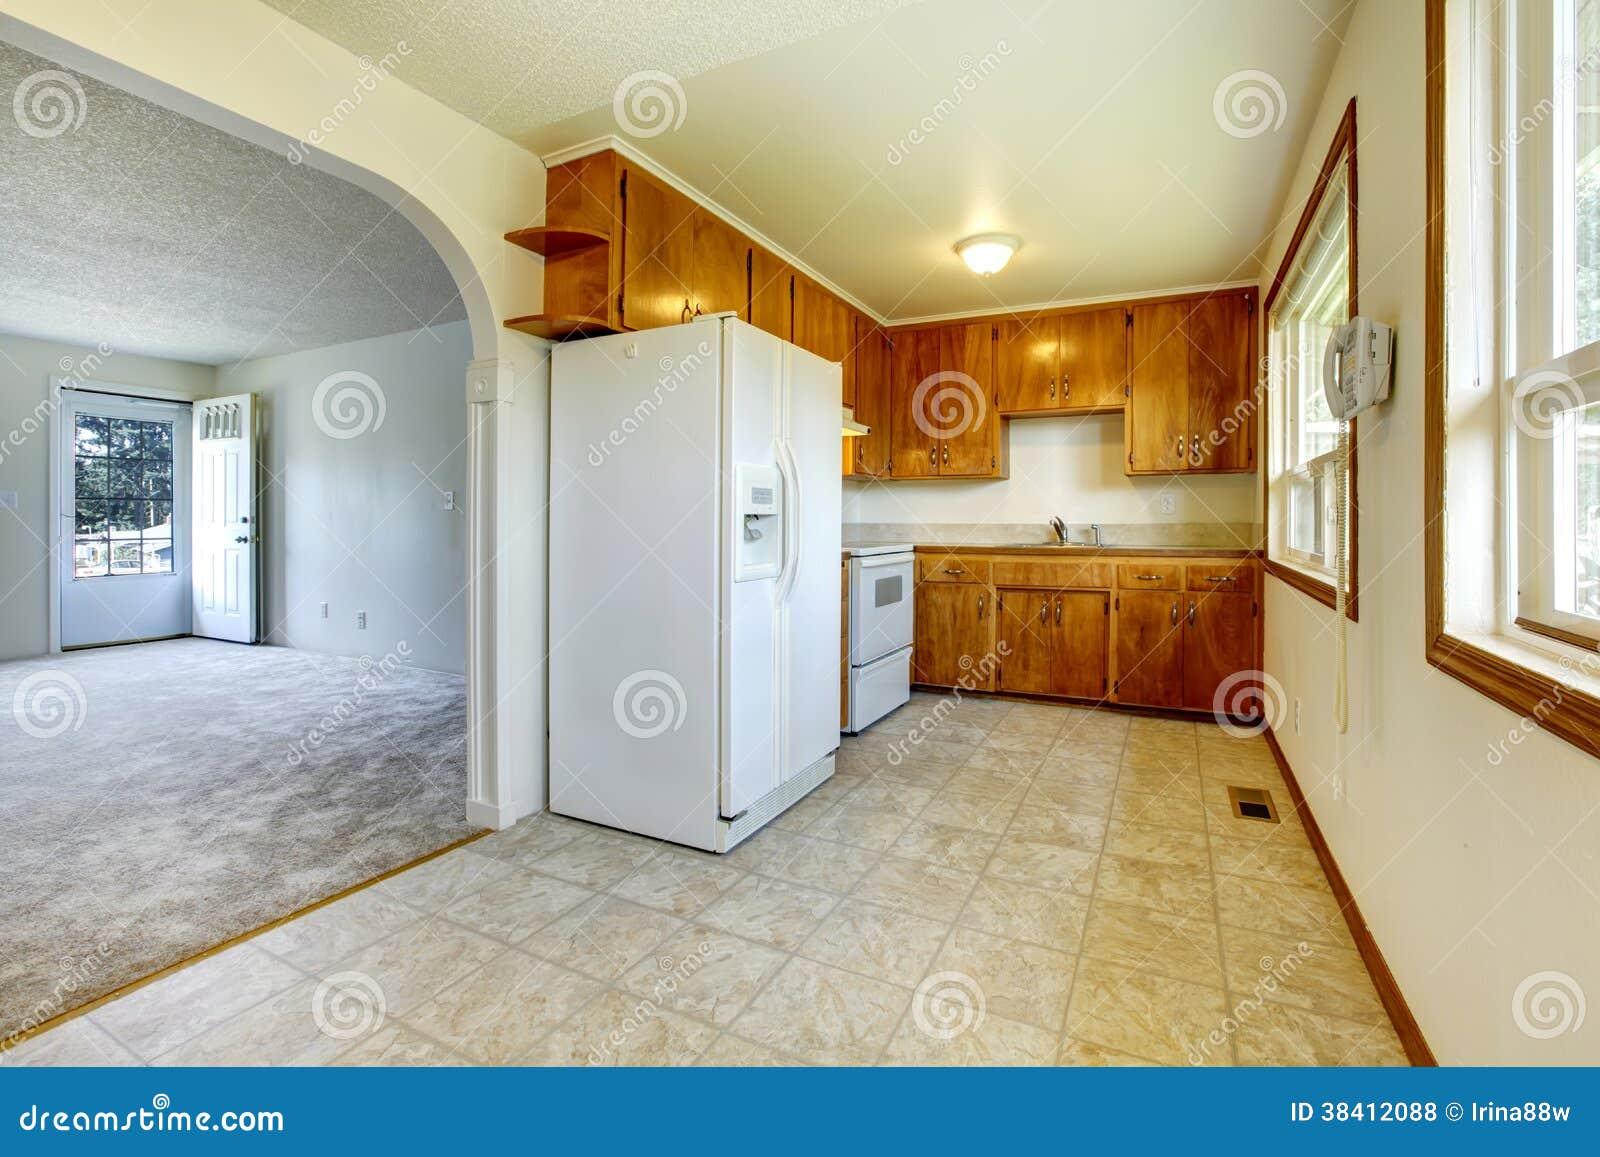 Kleine keuken en woonkamer royalty vrije stock foto's   afbeelding ...